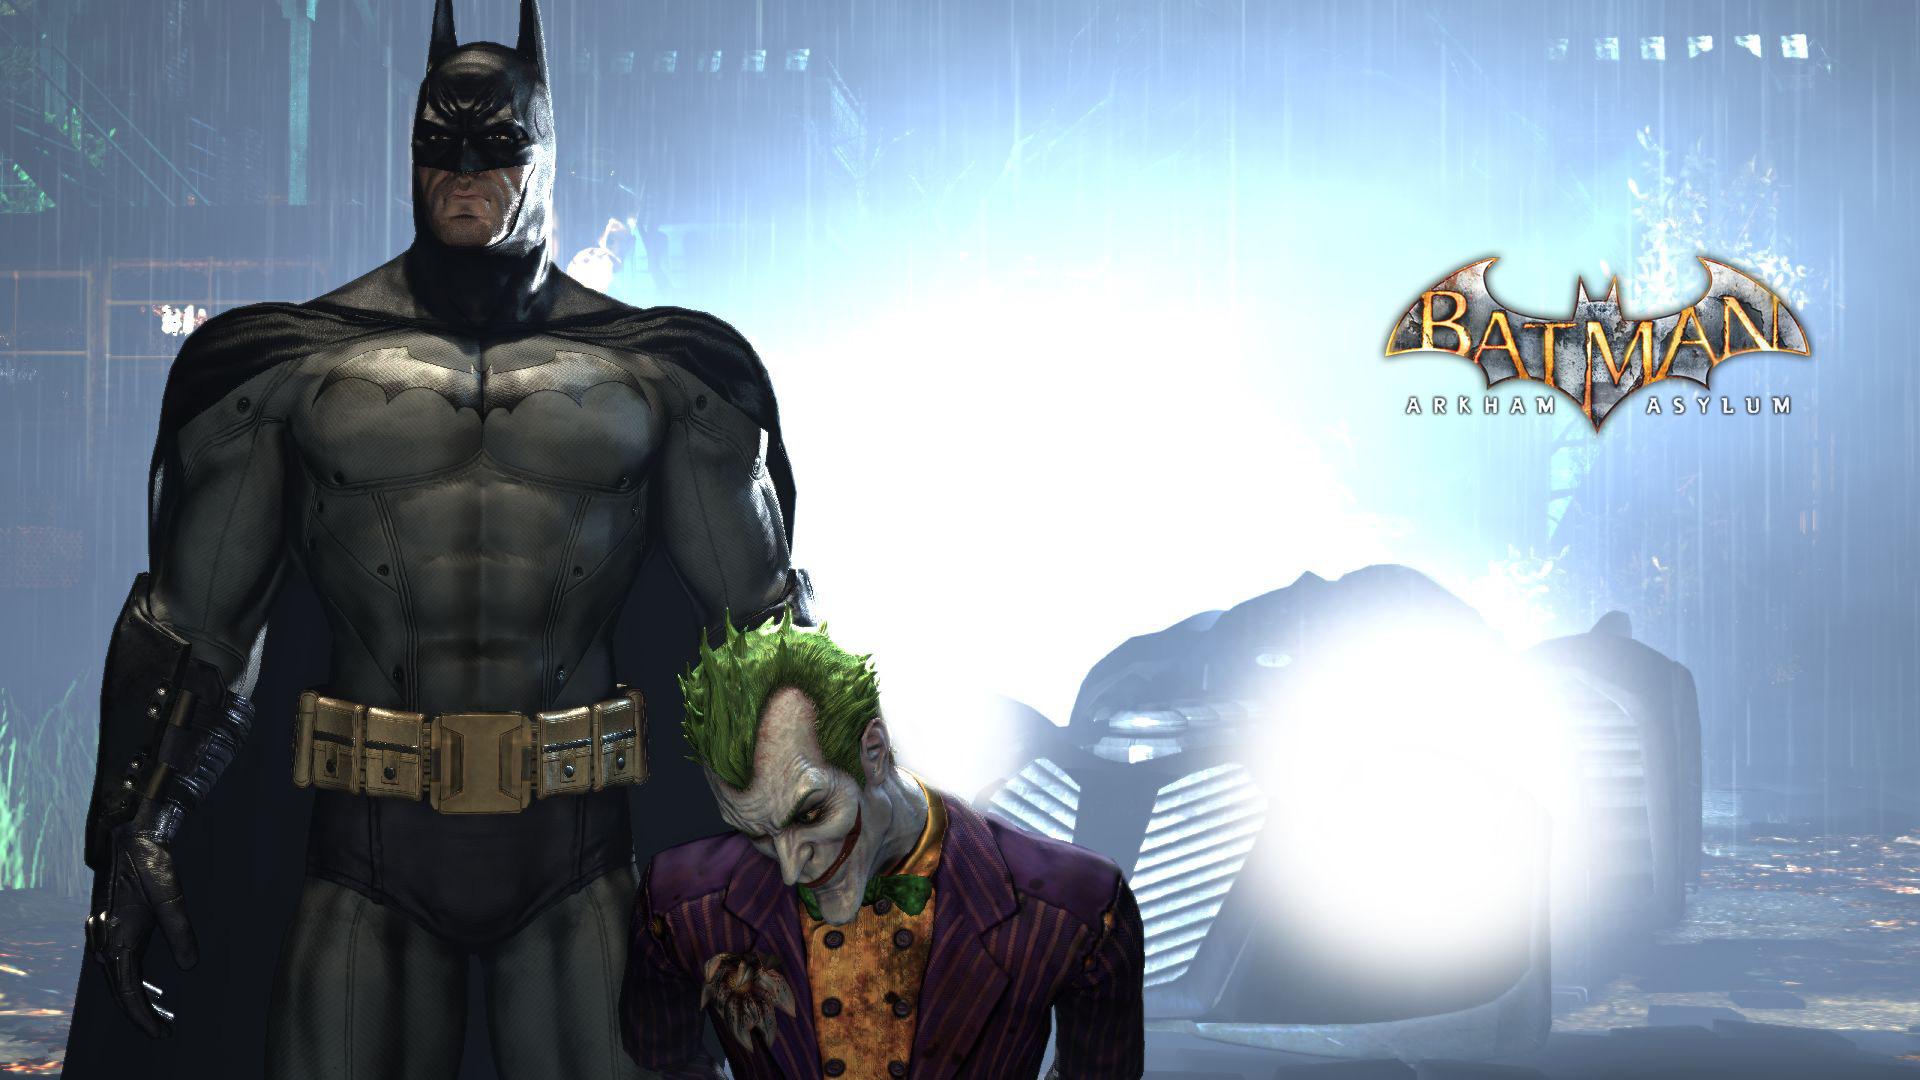 HD Batman Arkham Asylum Wallpapers Full HD Pictures 1920x1080